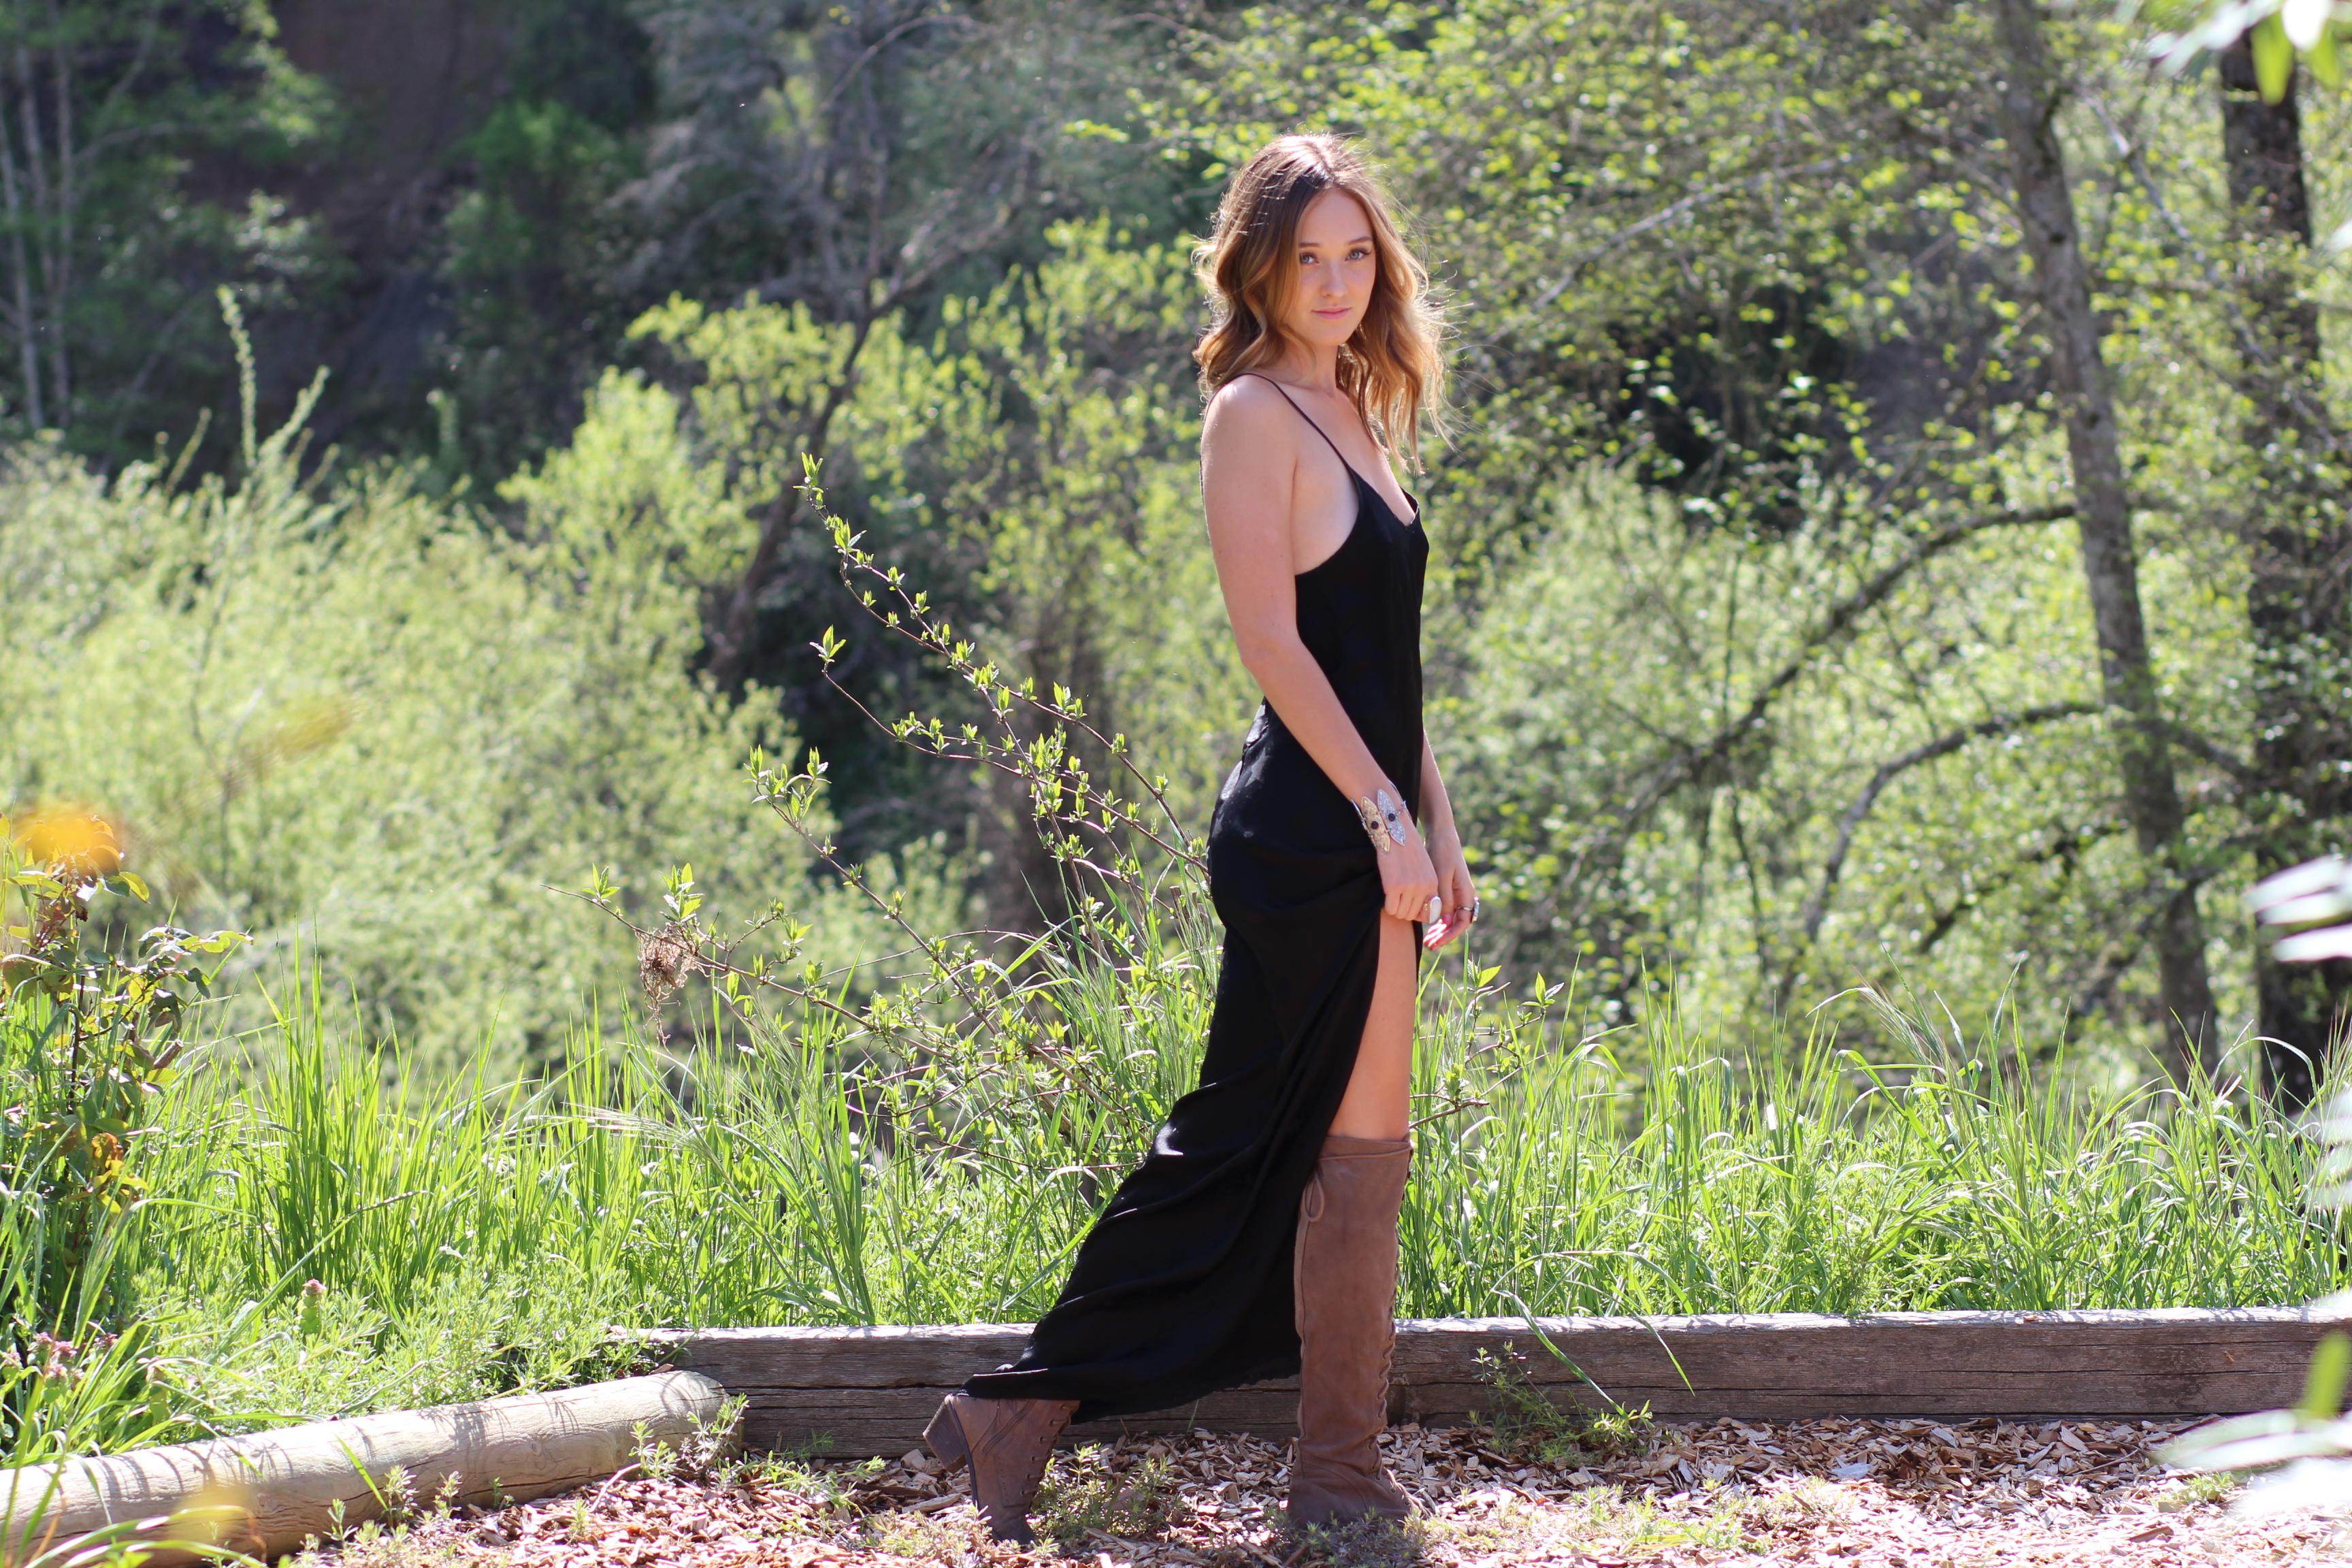 McKenna Faith, Coyote Sonoma, Healdsburg, California